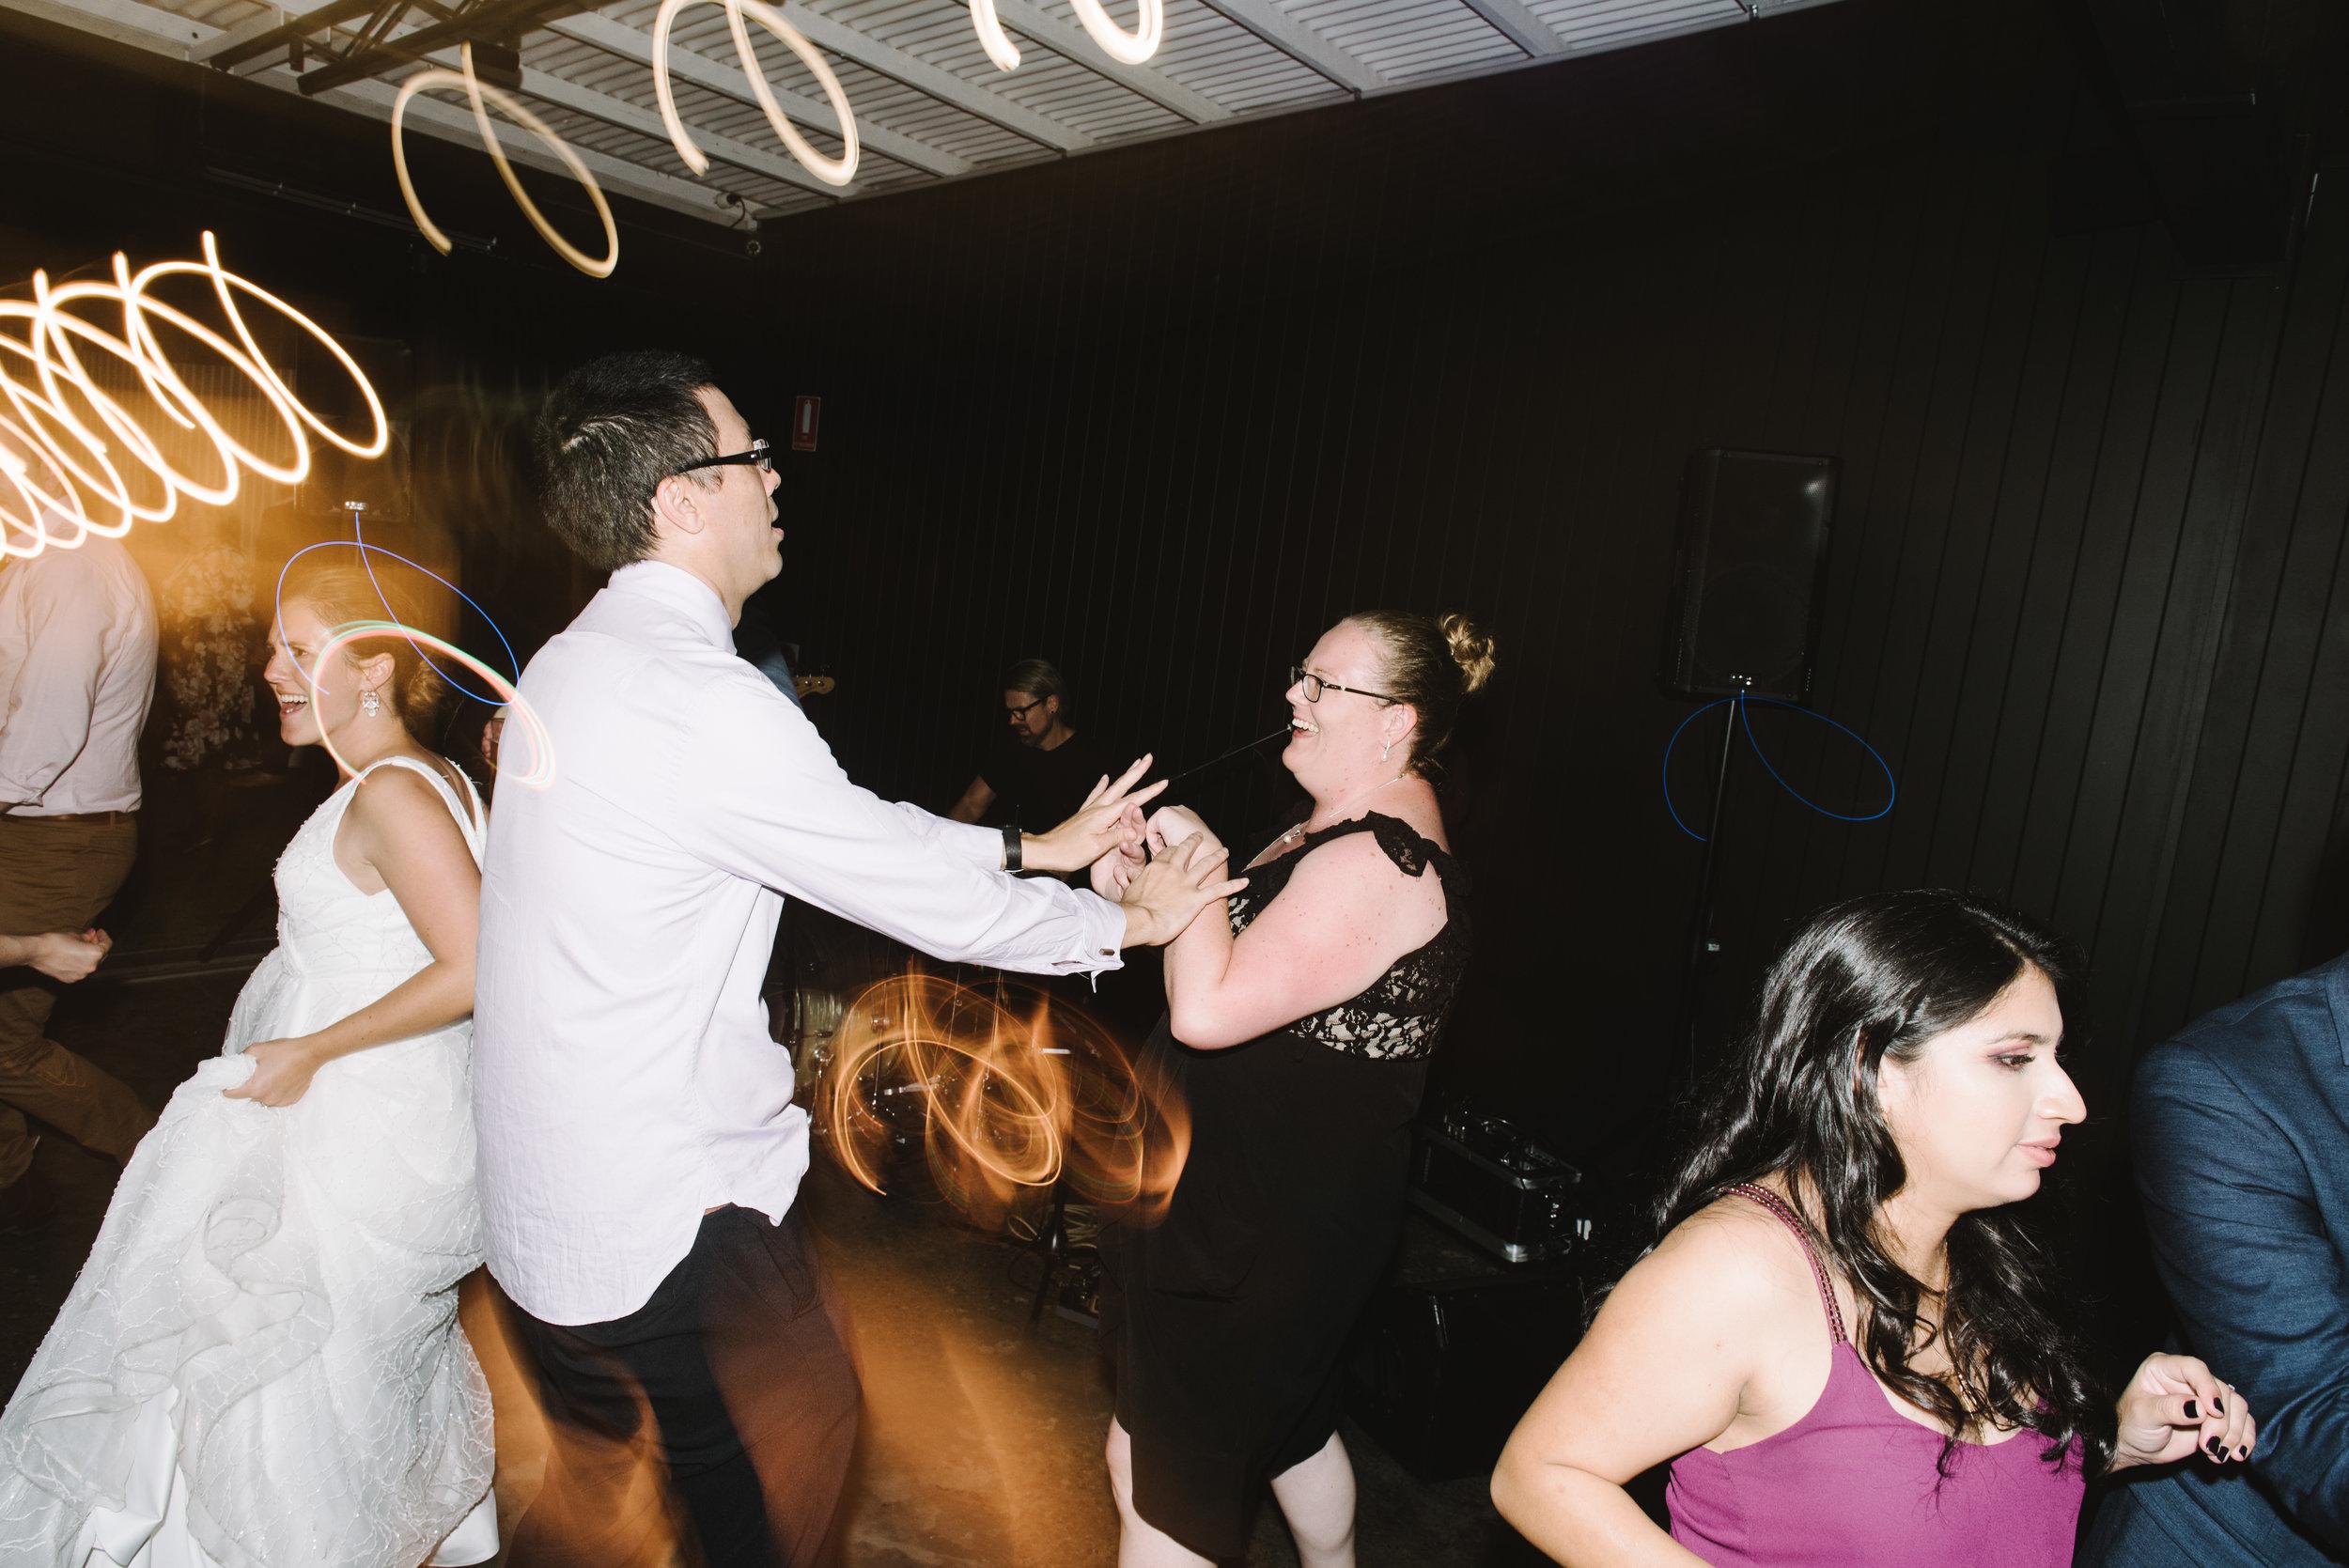 refinery-brisbane-wedding-reception-16.jpg